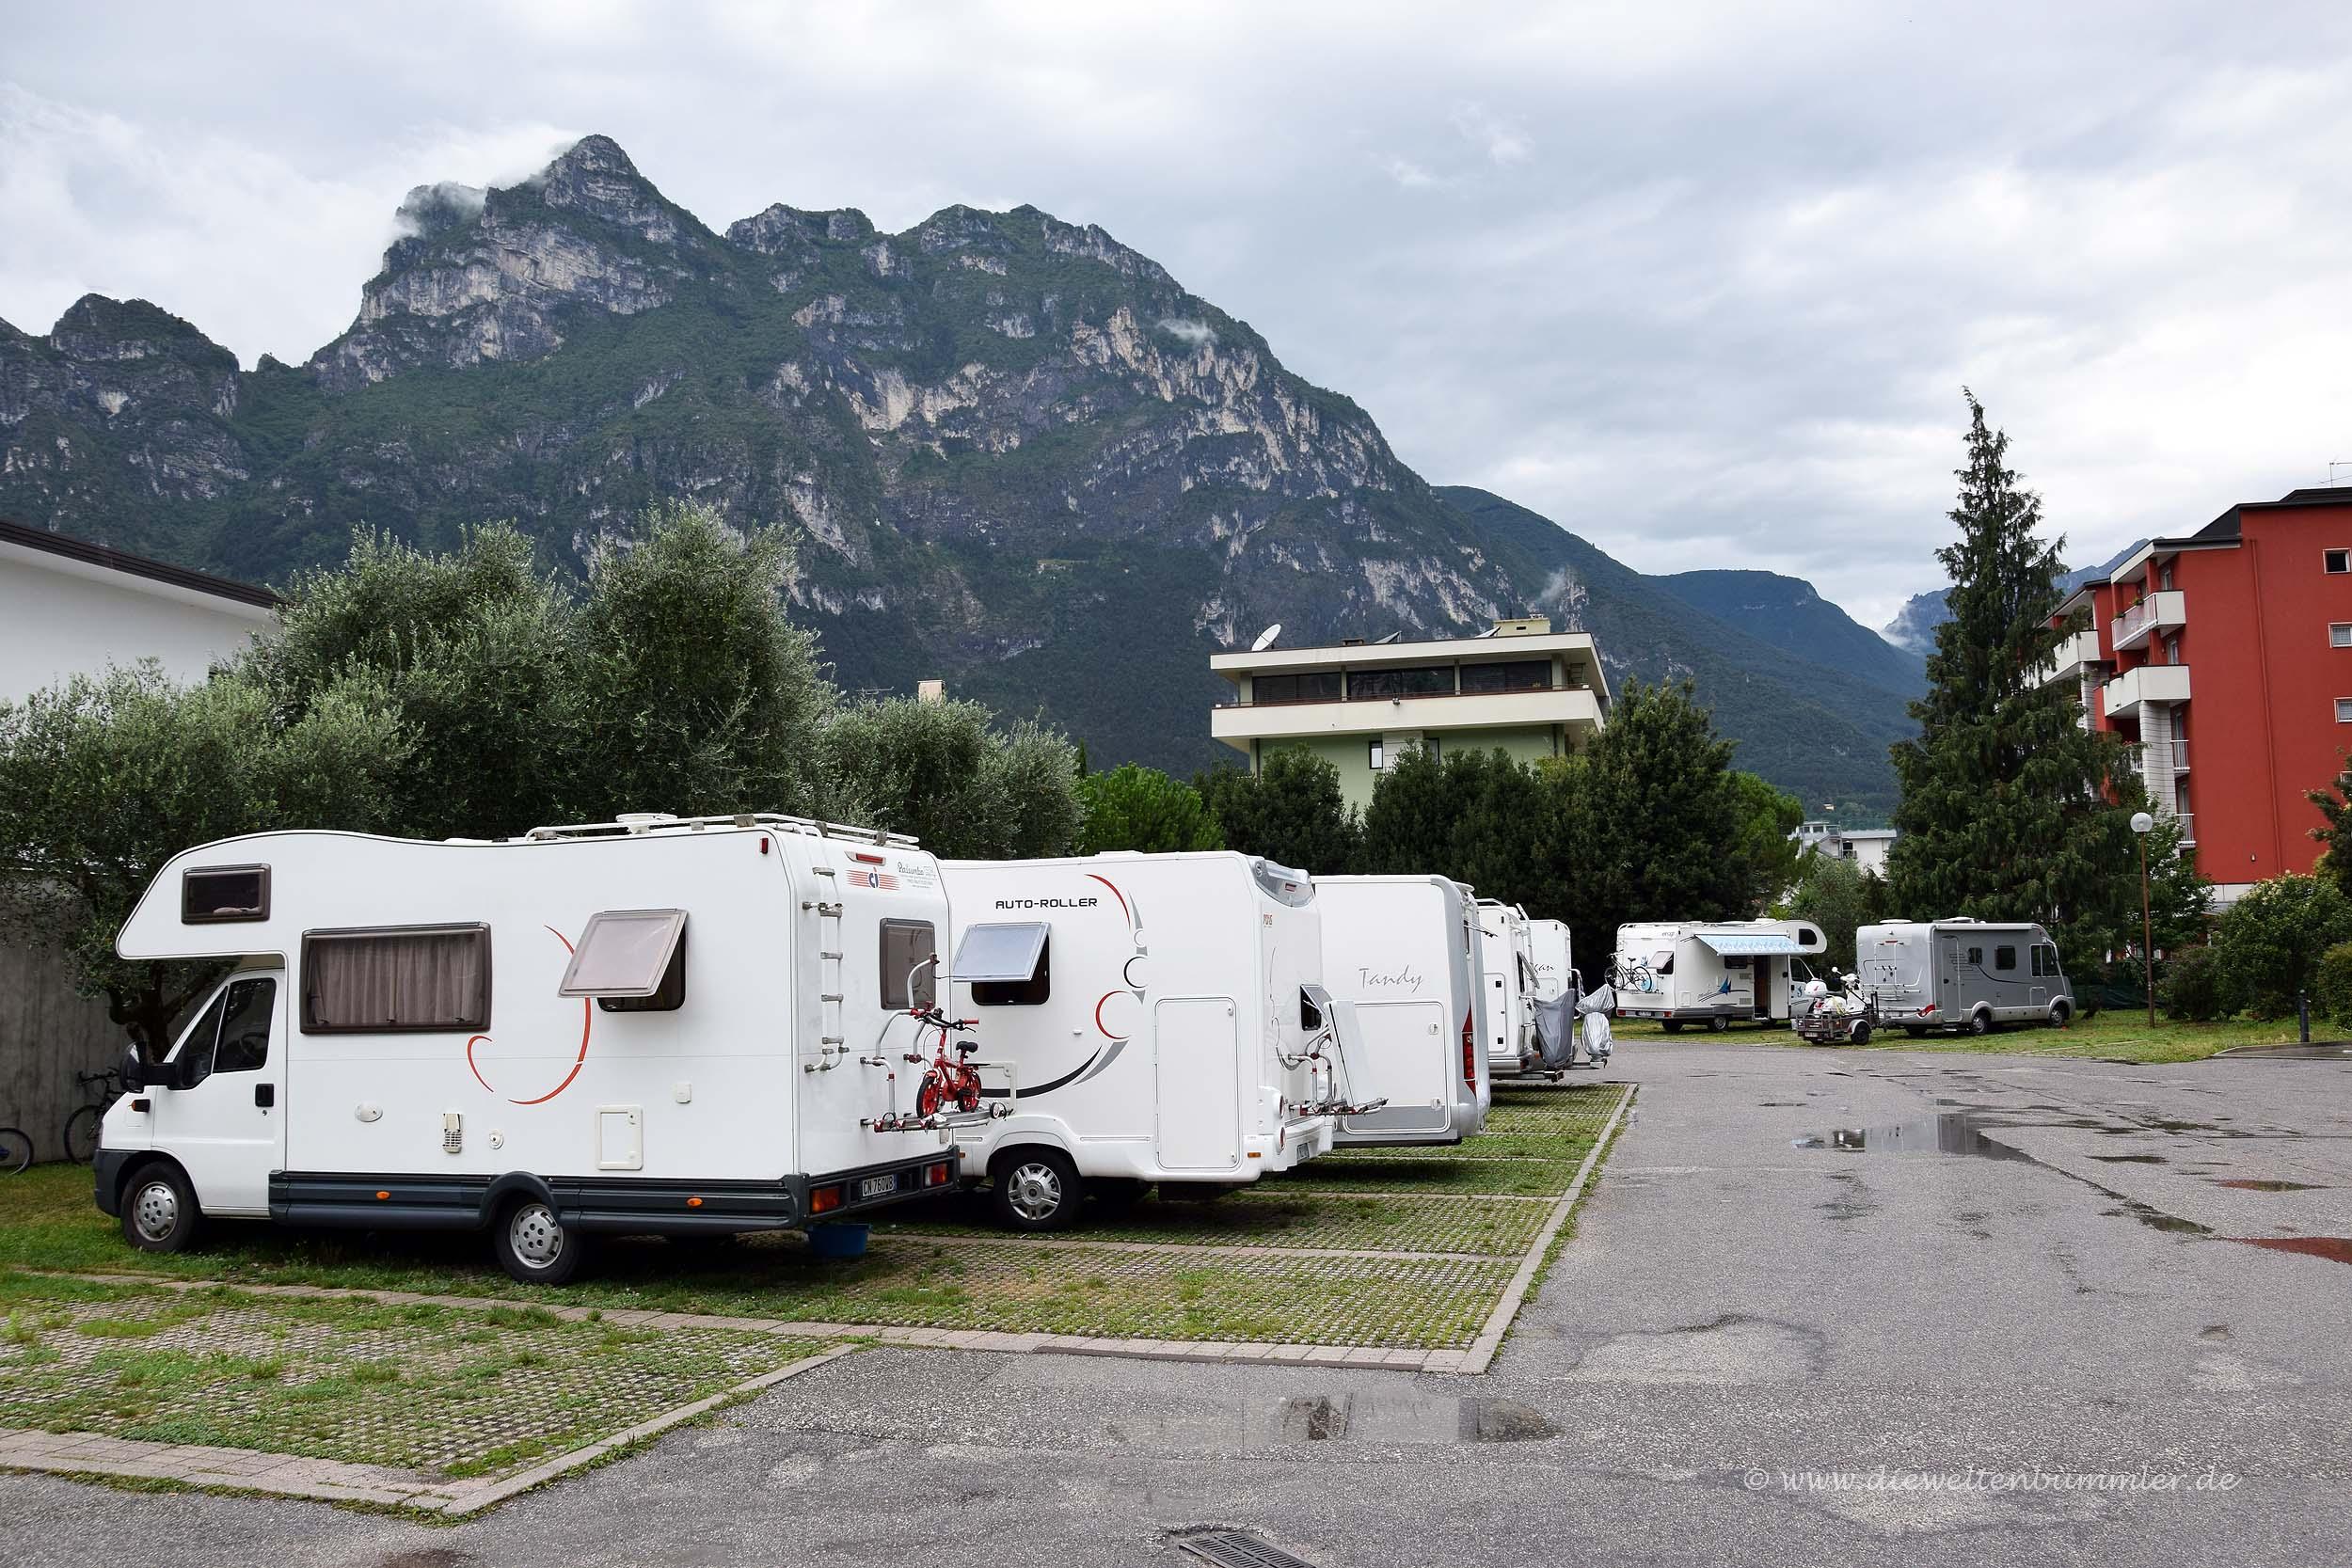 Wohnmobilstellplatz in Riva del Garda